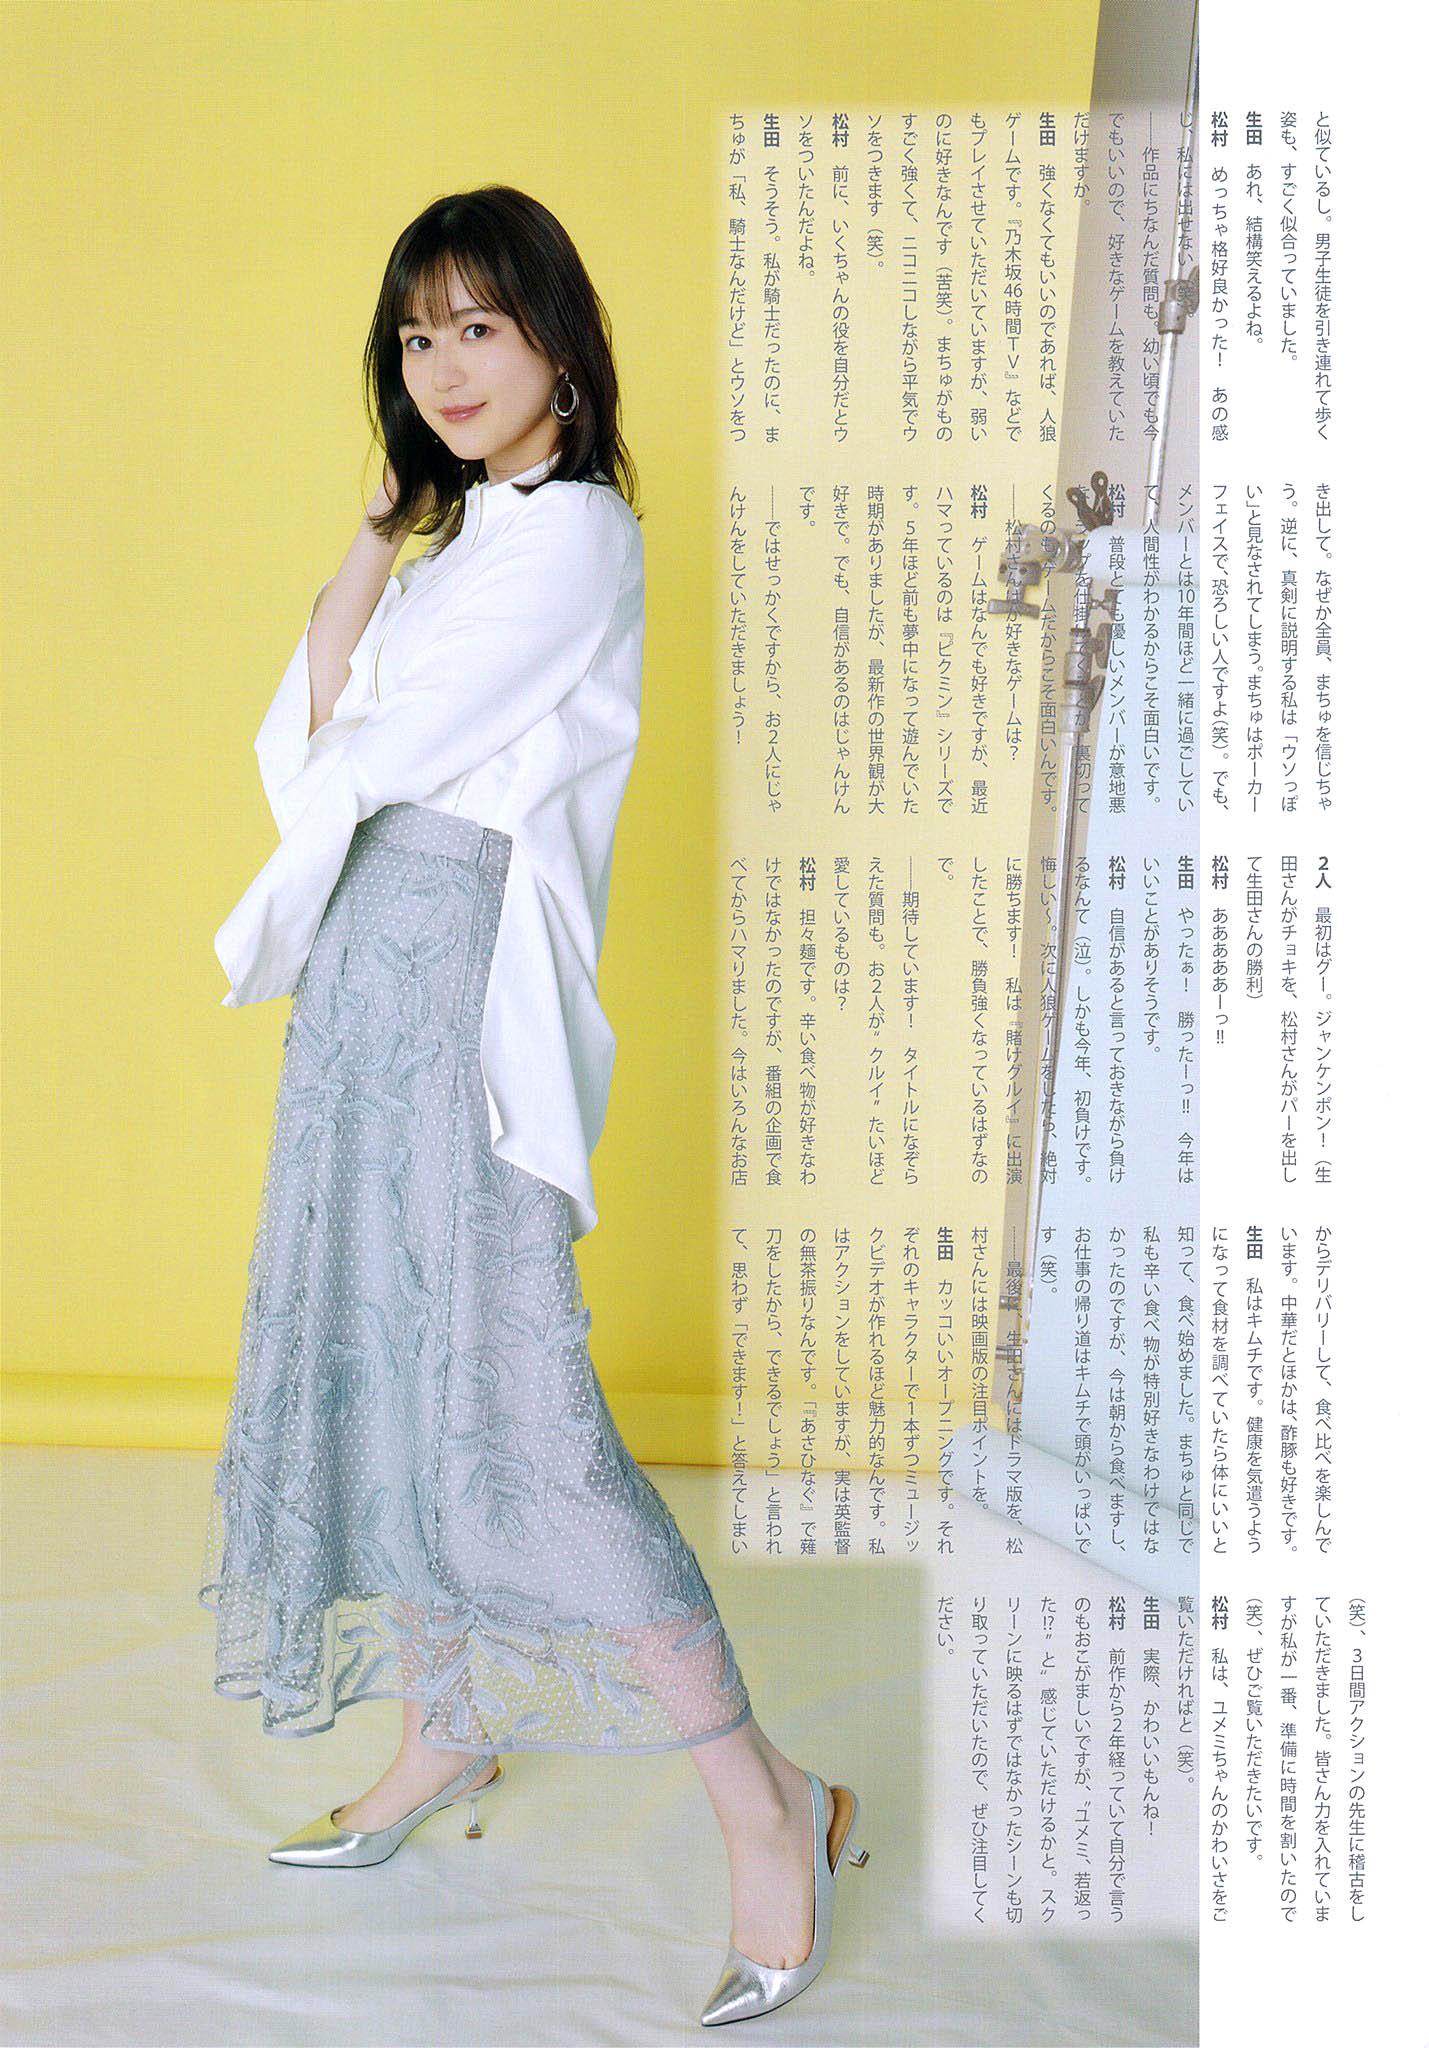 EIkuta SMatsumura Big One Girls 2105 04.jpg